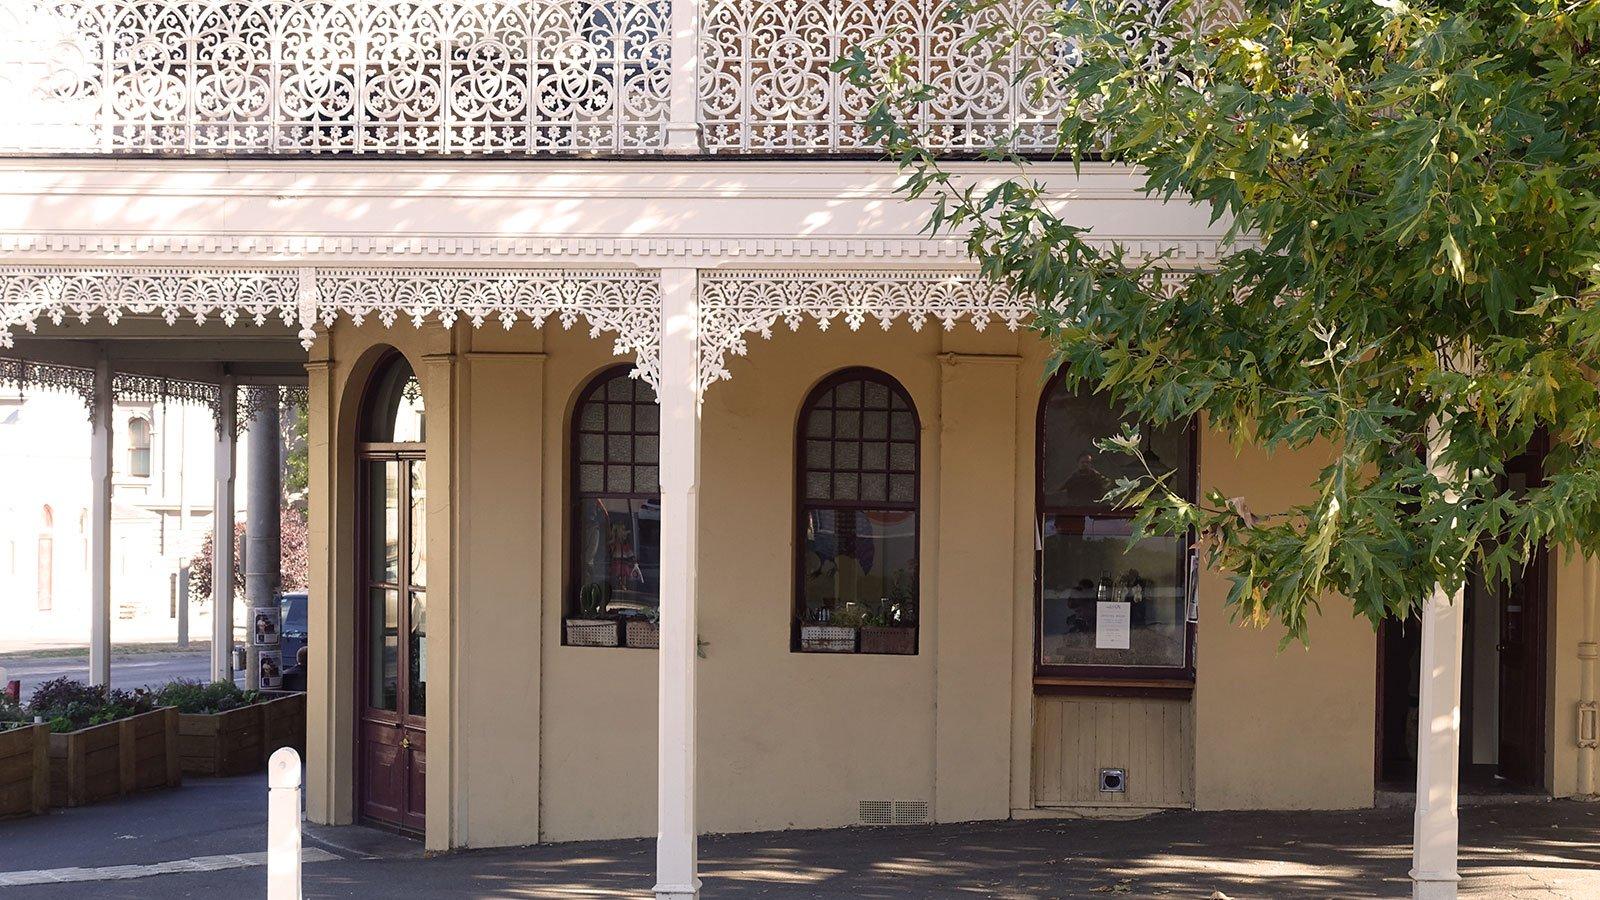 The Local, Castlemaine, Goldfields, Victoria, Australia